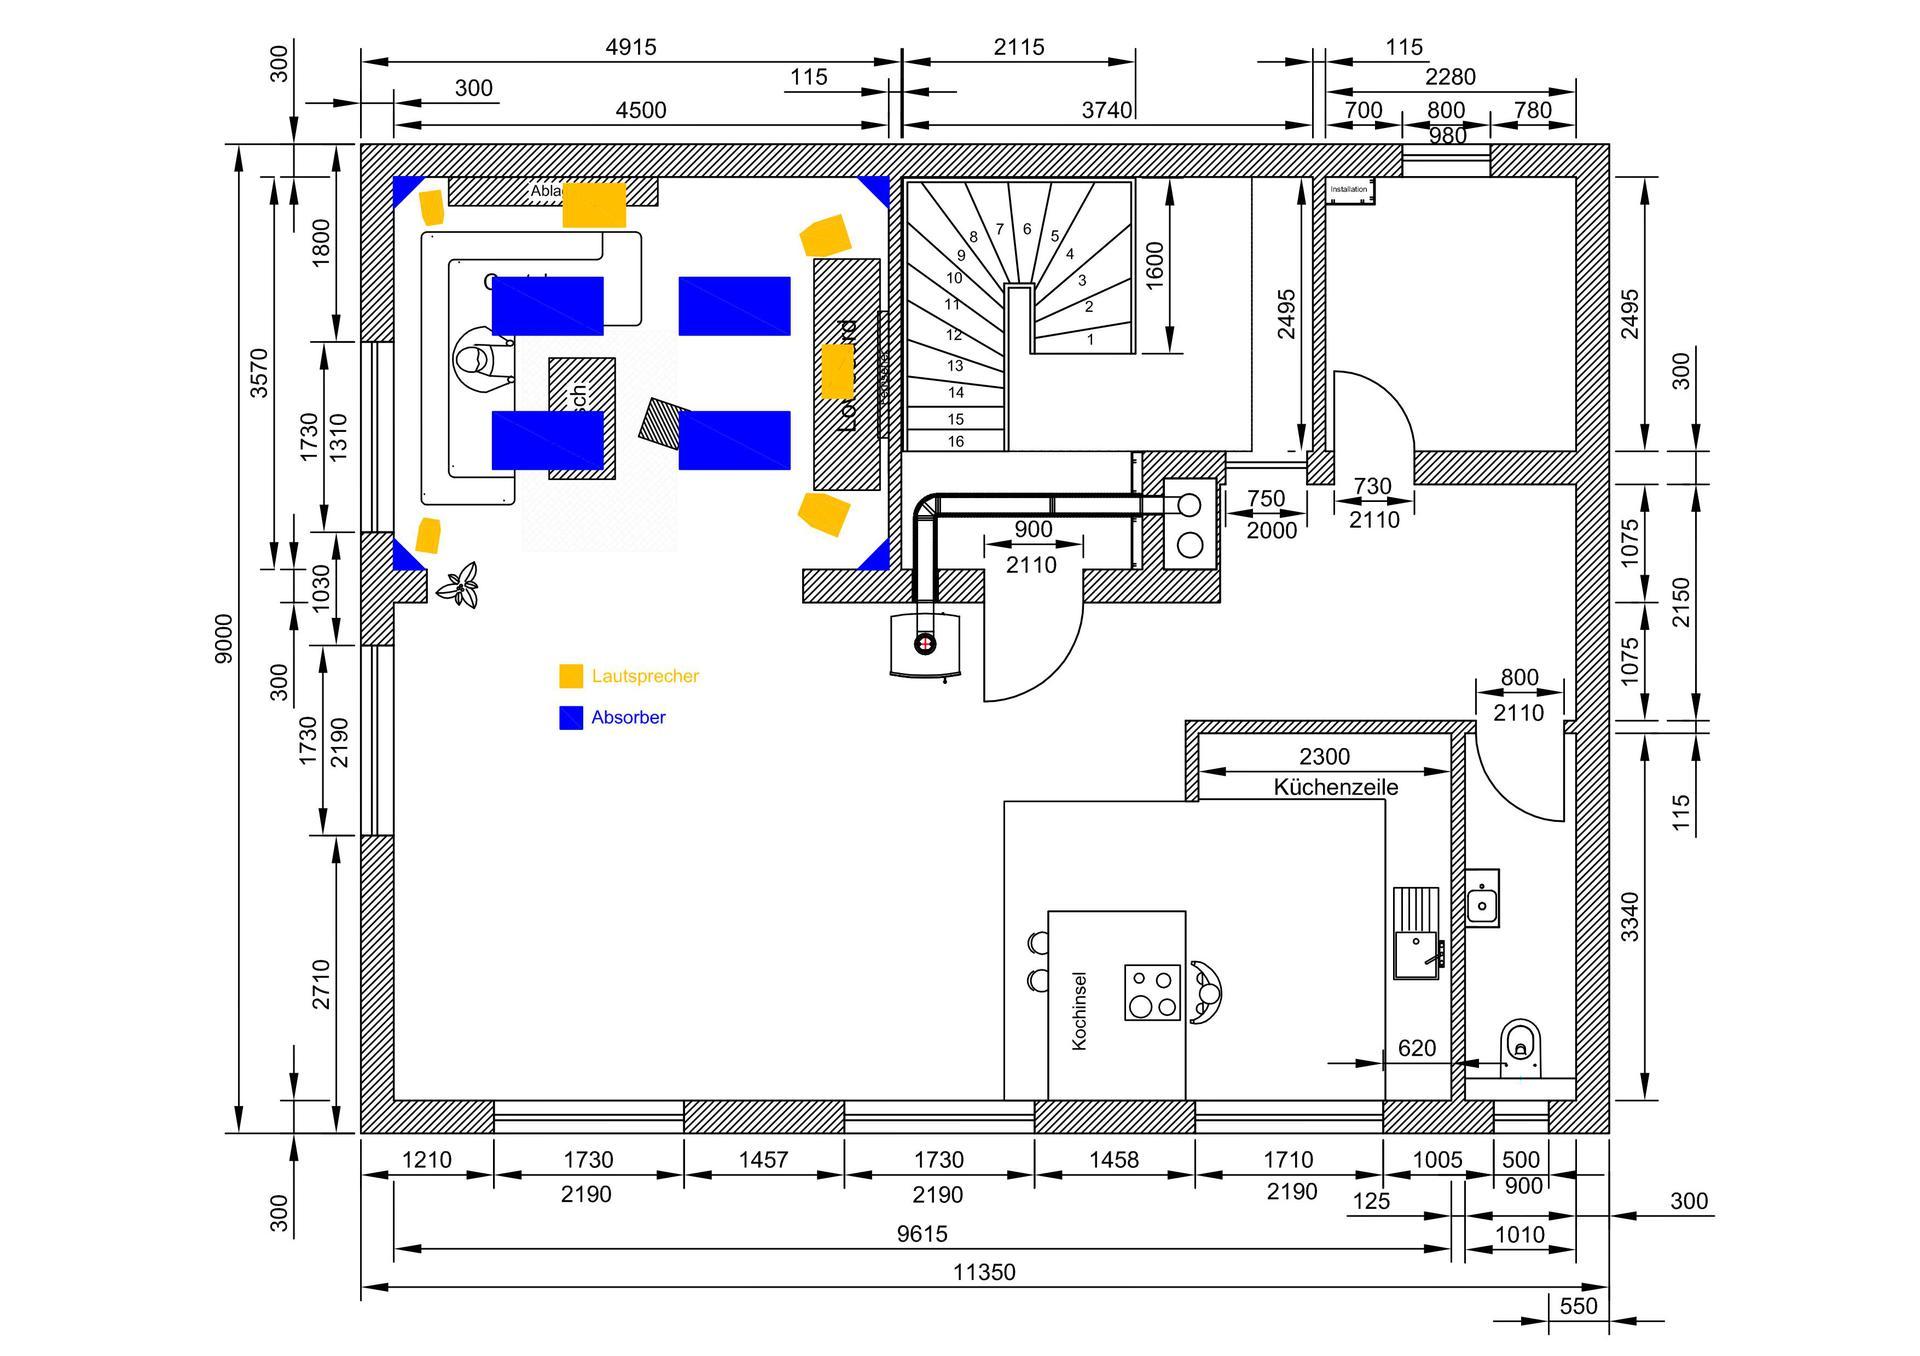 Grundriss wohnzimmer grundriss grundrisswohnzimmer - Grundriss wohnzimmer ...